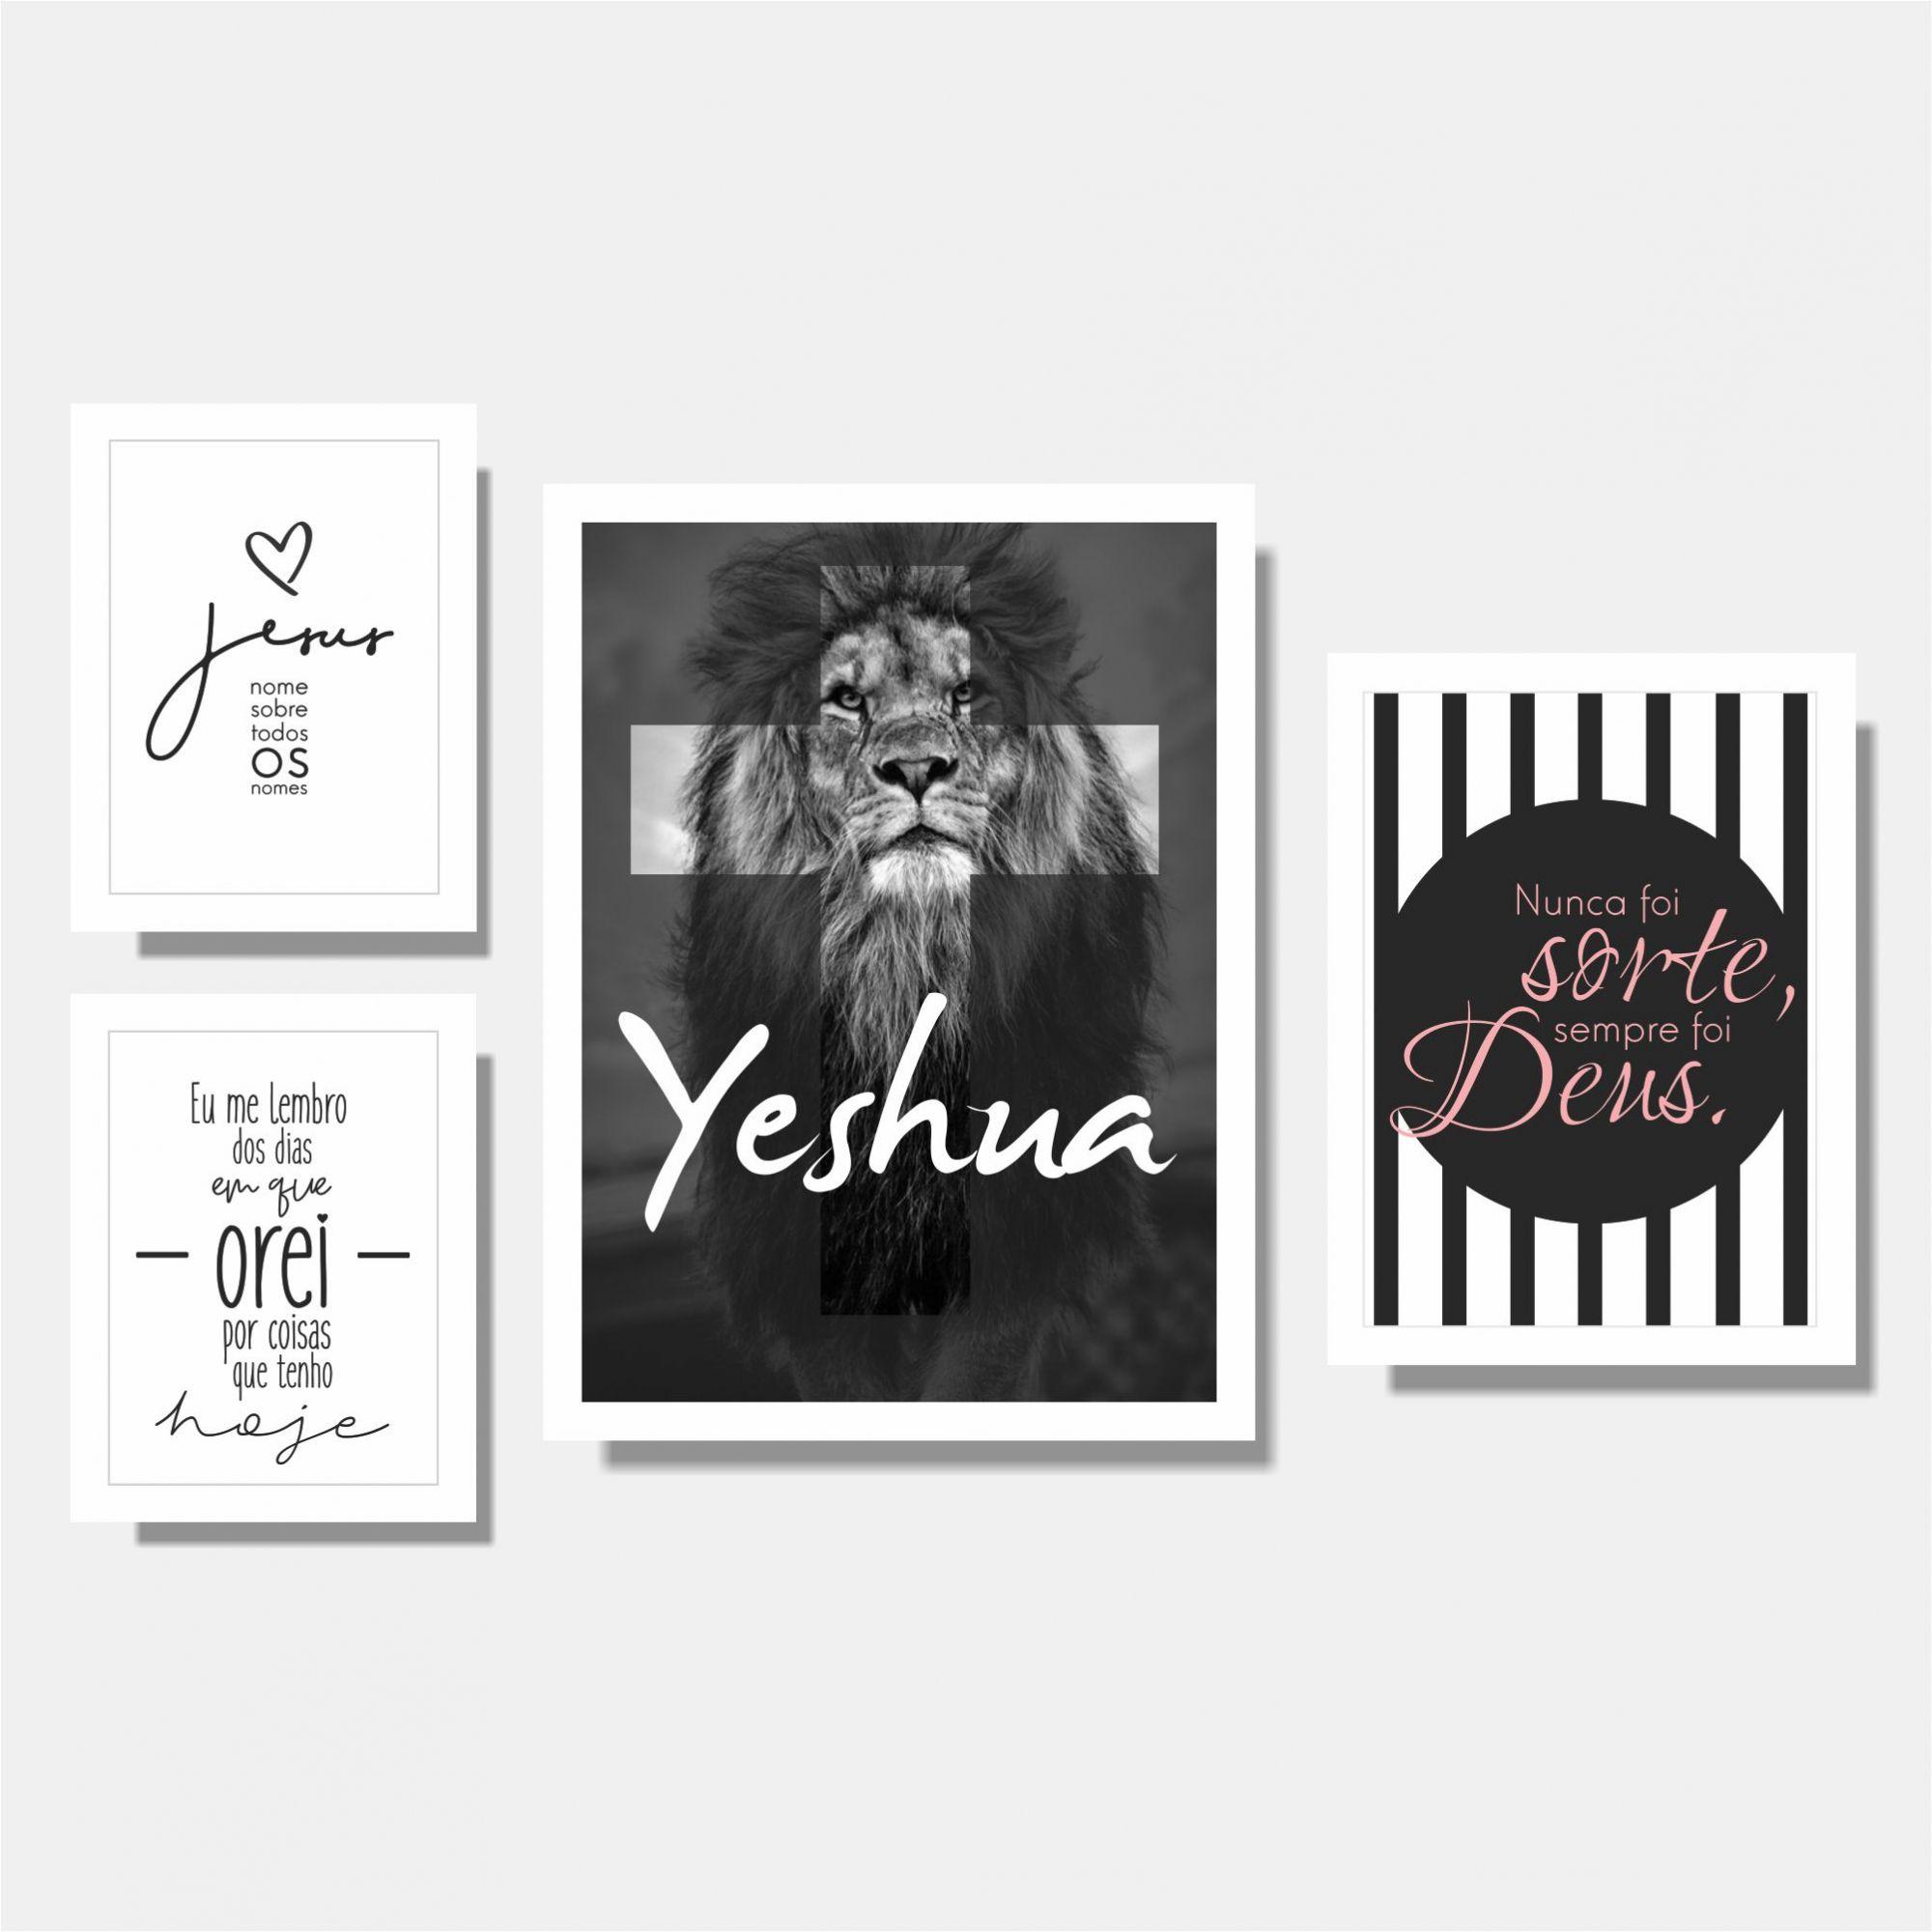 Kit Yeshua + Jesus + Nunca Foi Sorte + Eu me Lembro A2